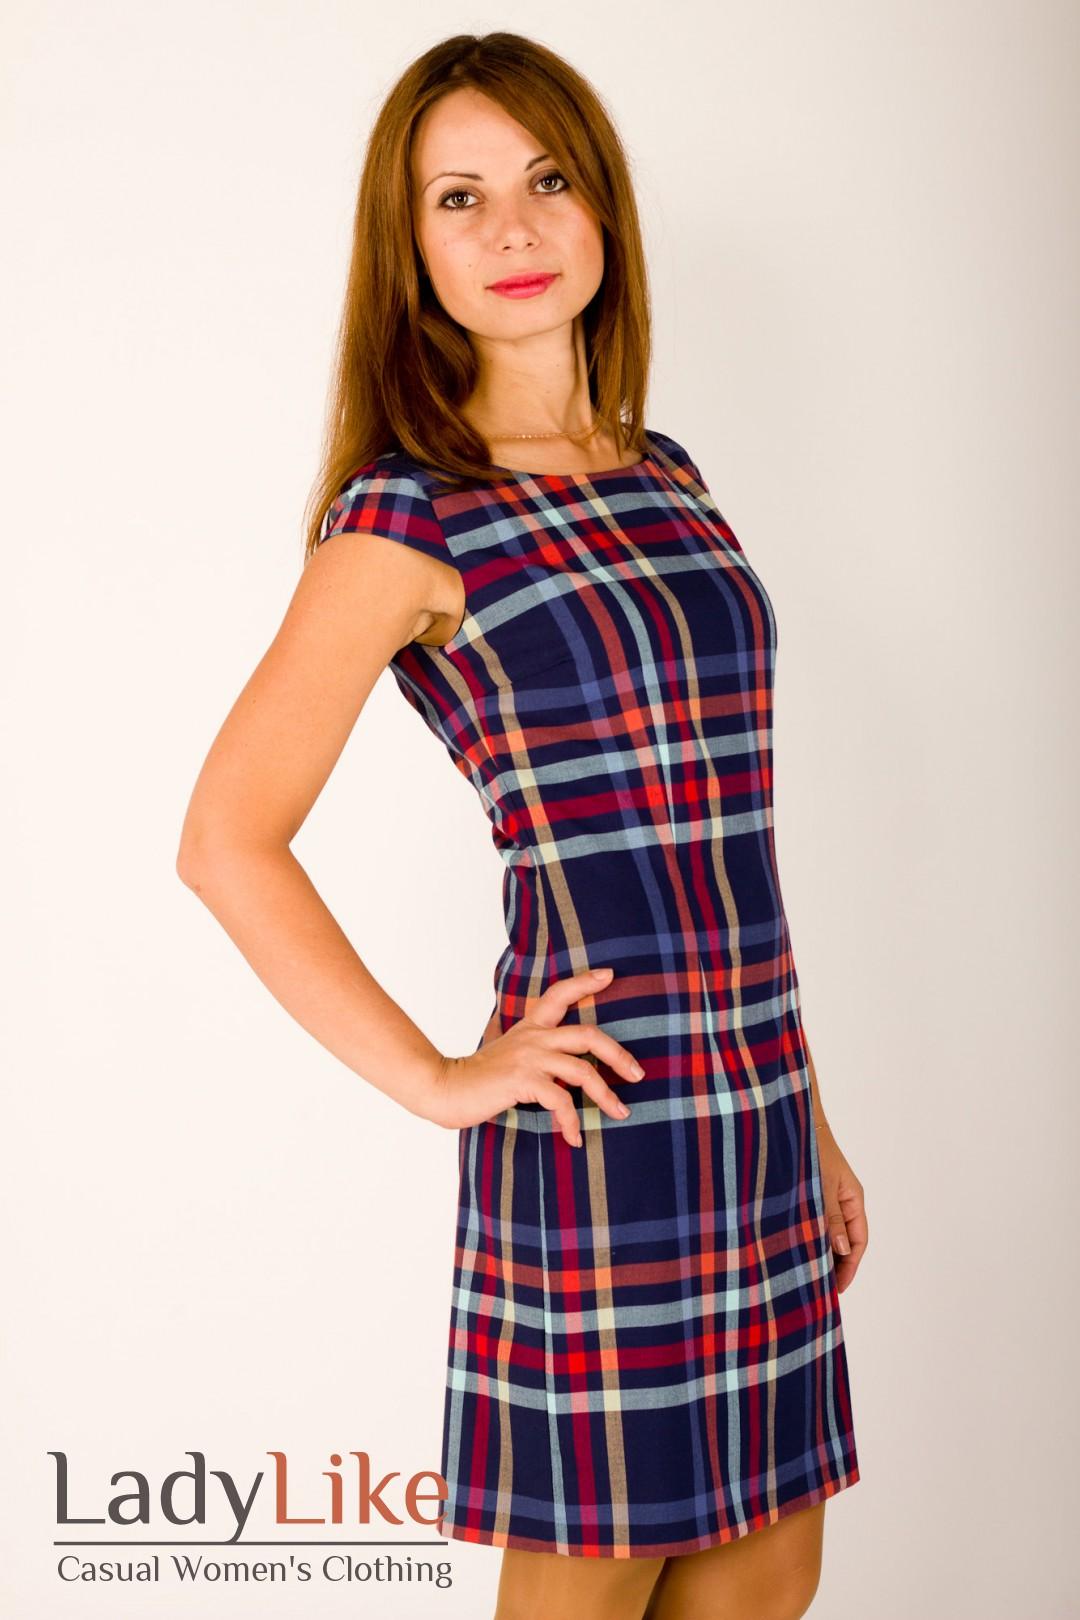 Как раскроить юбку полусолнце на ткани без рисунка и в 84